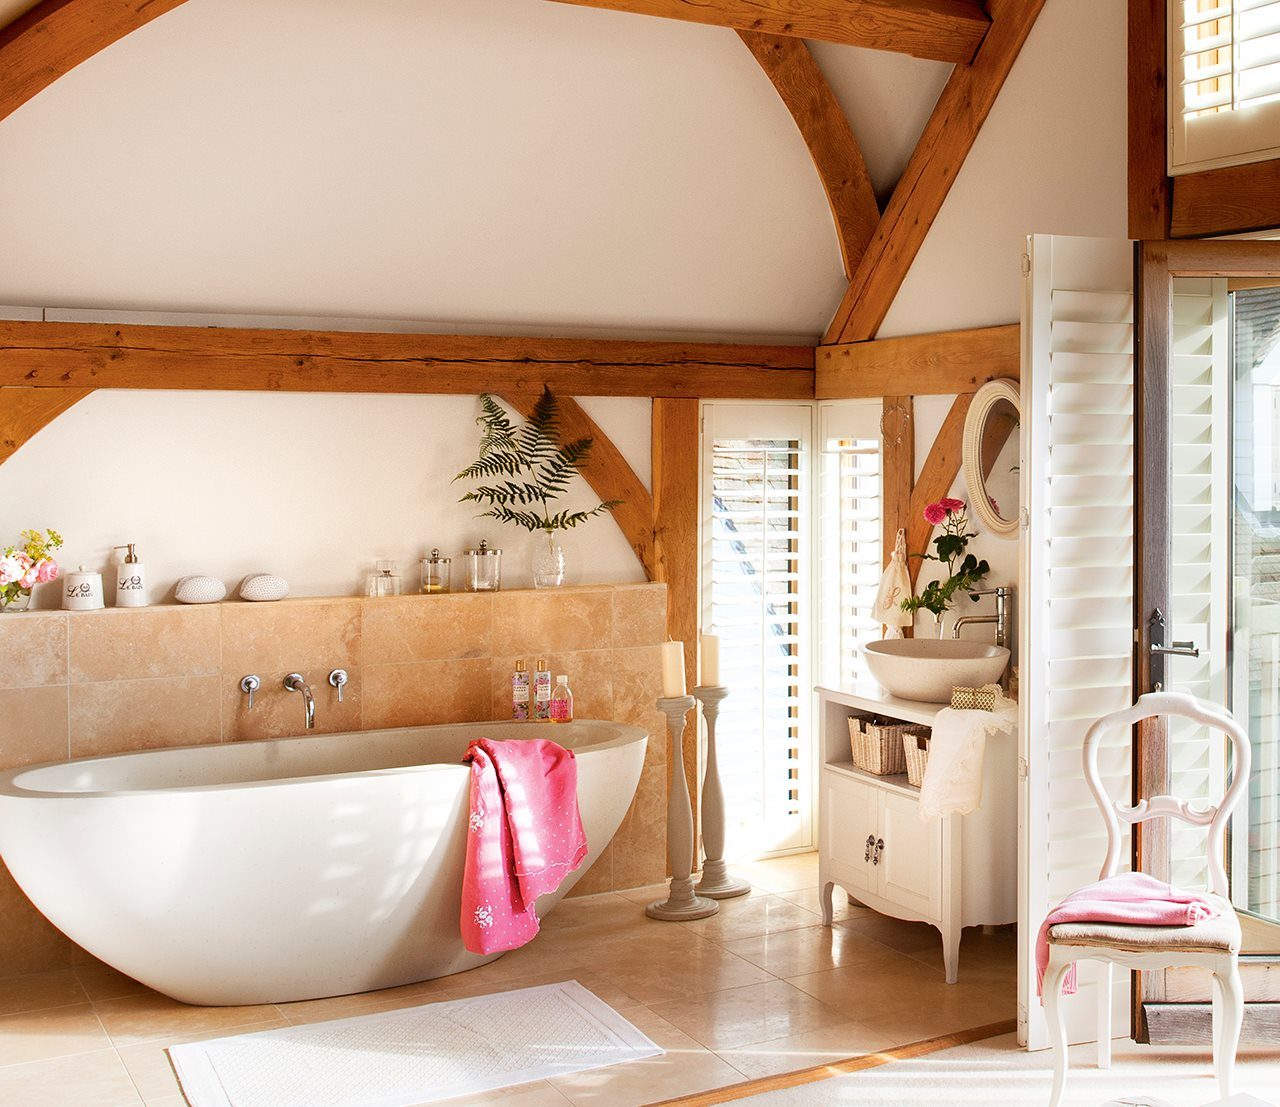 La casita de lady sophia - Repisas de marmol ...